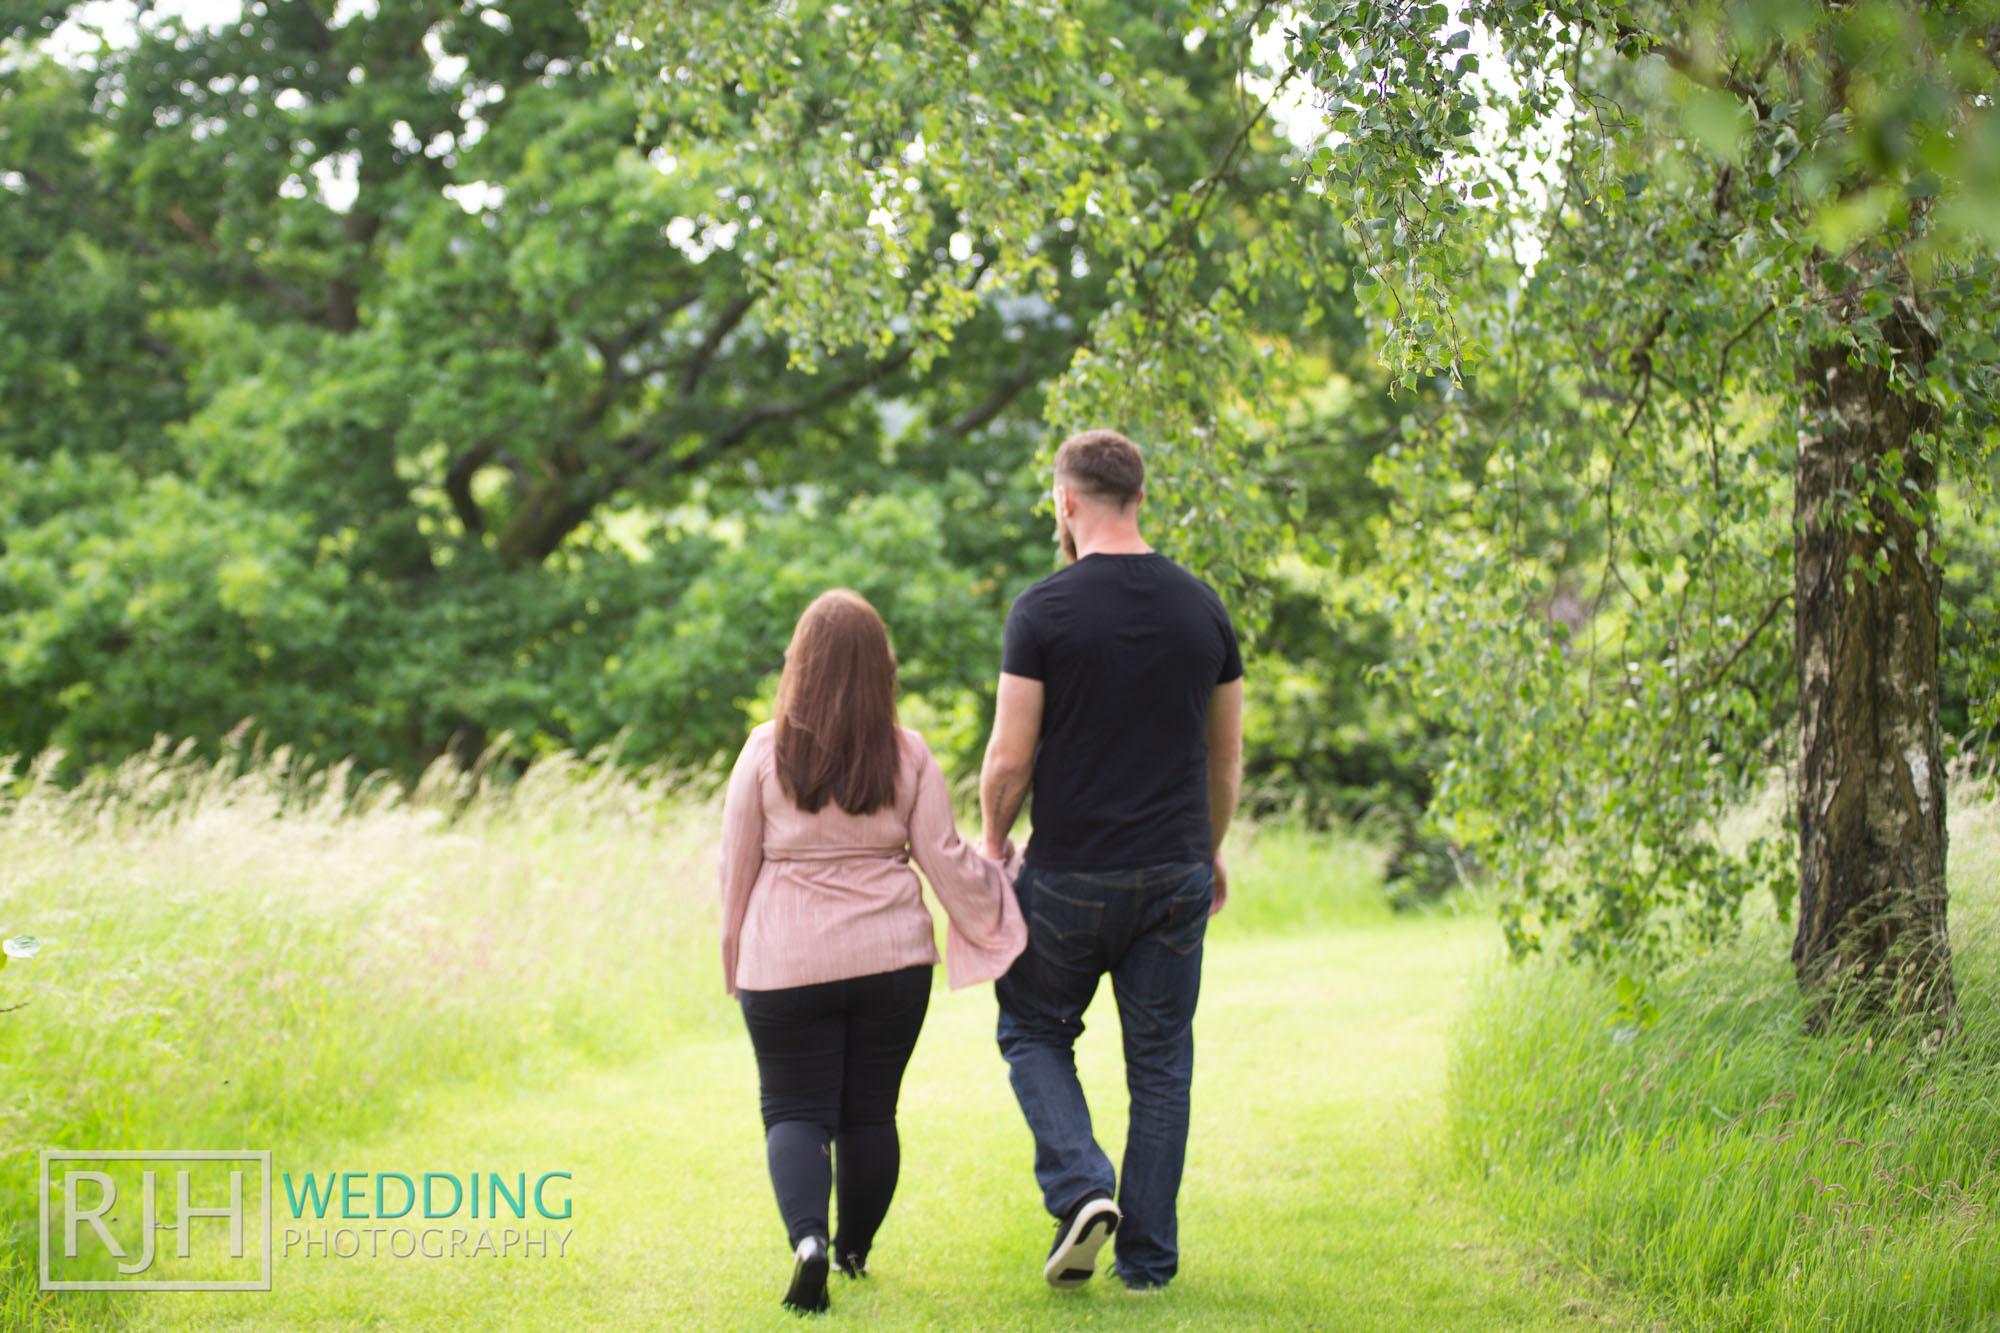 Osmaston Park Wedding Photographer - Jodie & Oli_005_IMG_7471.jpg